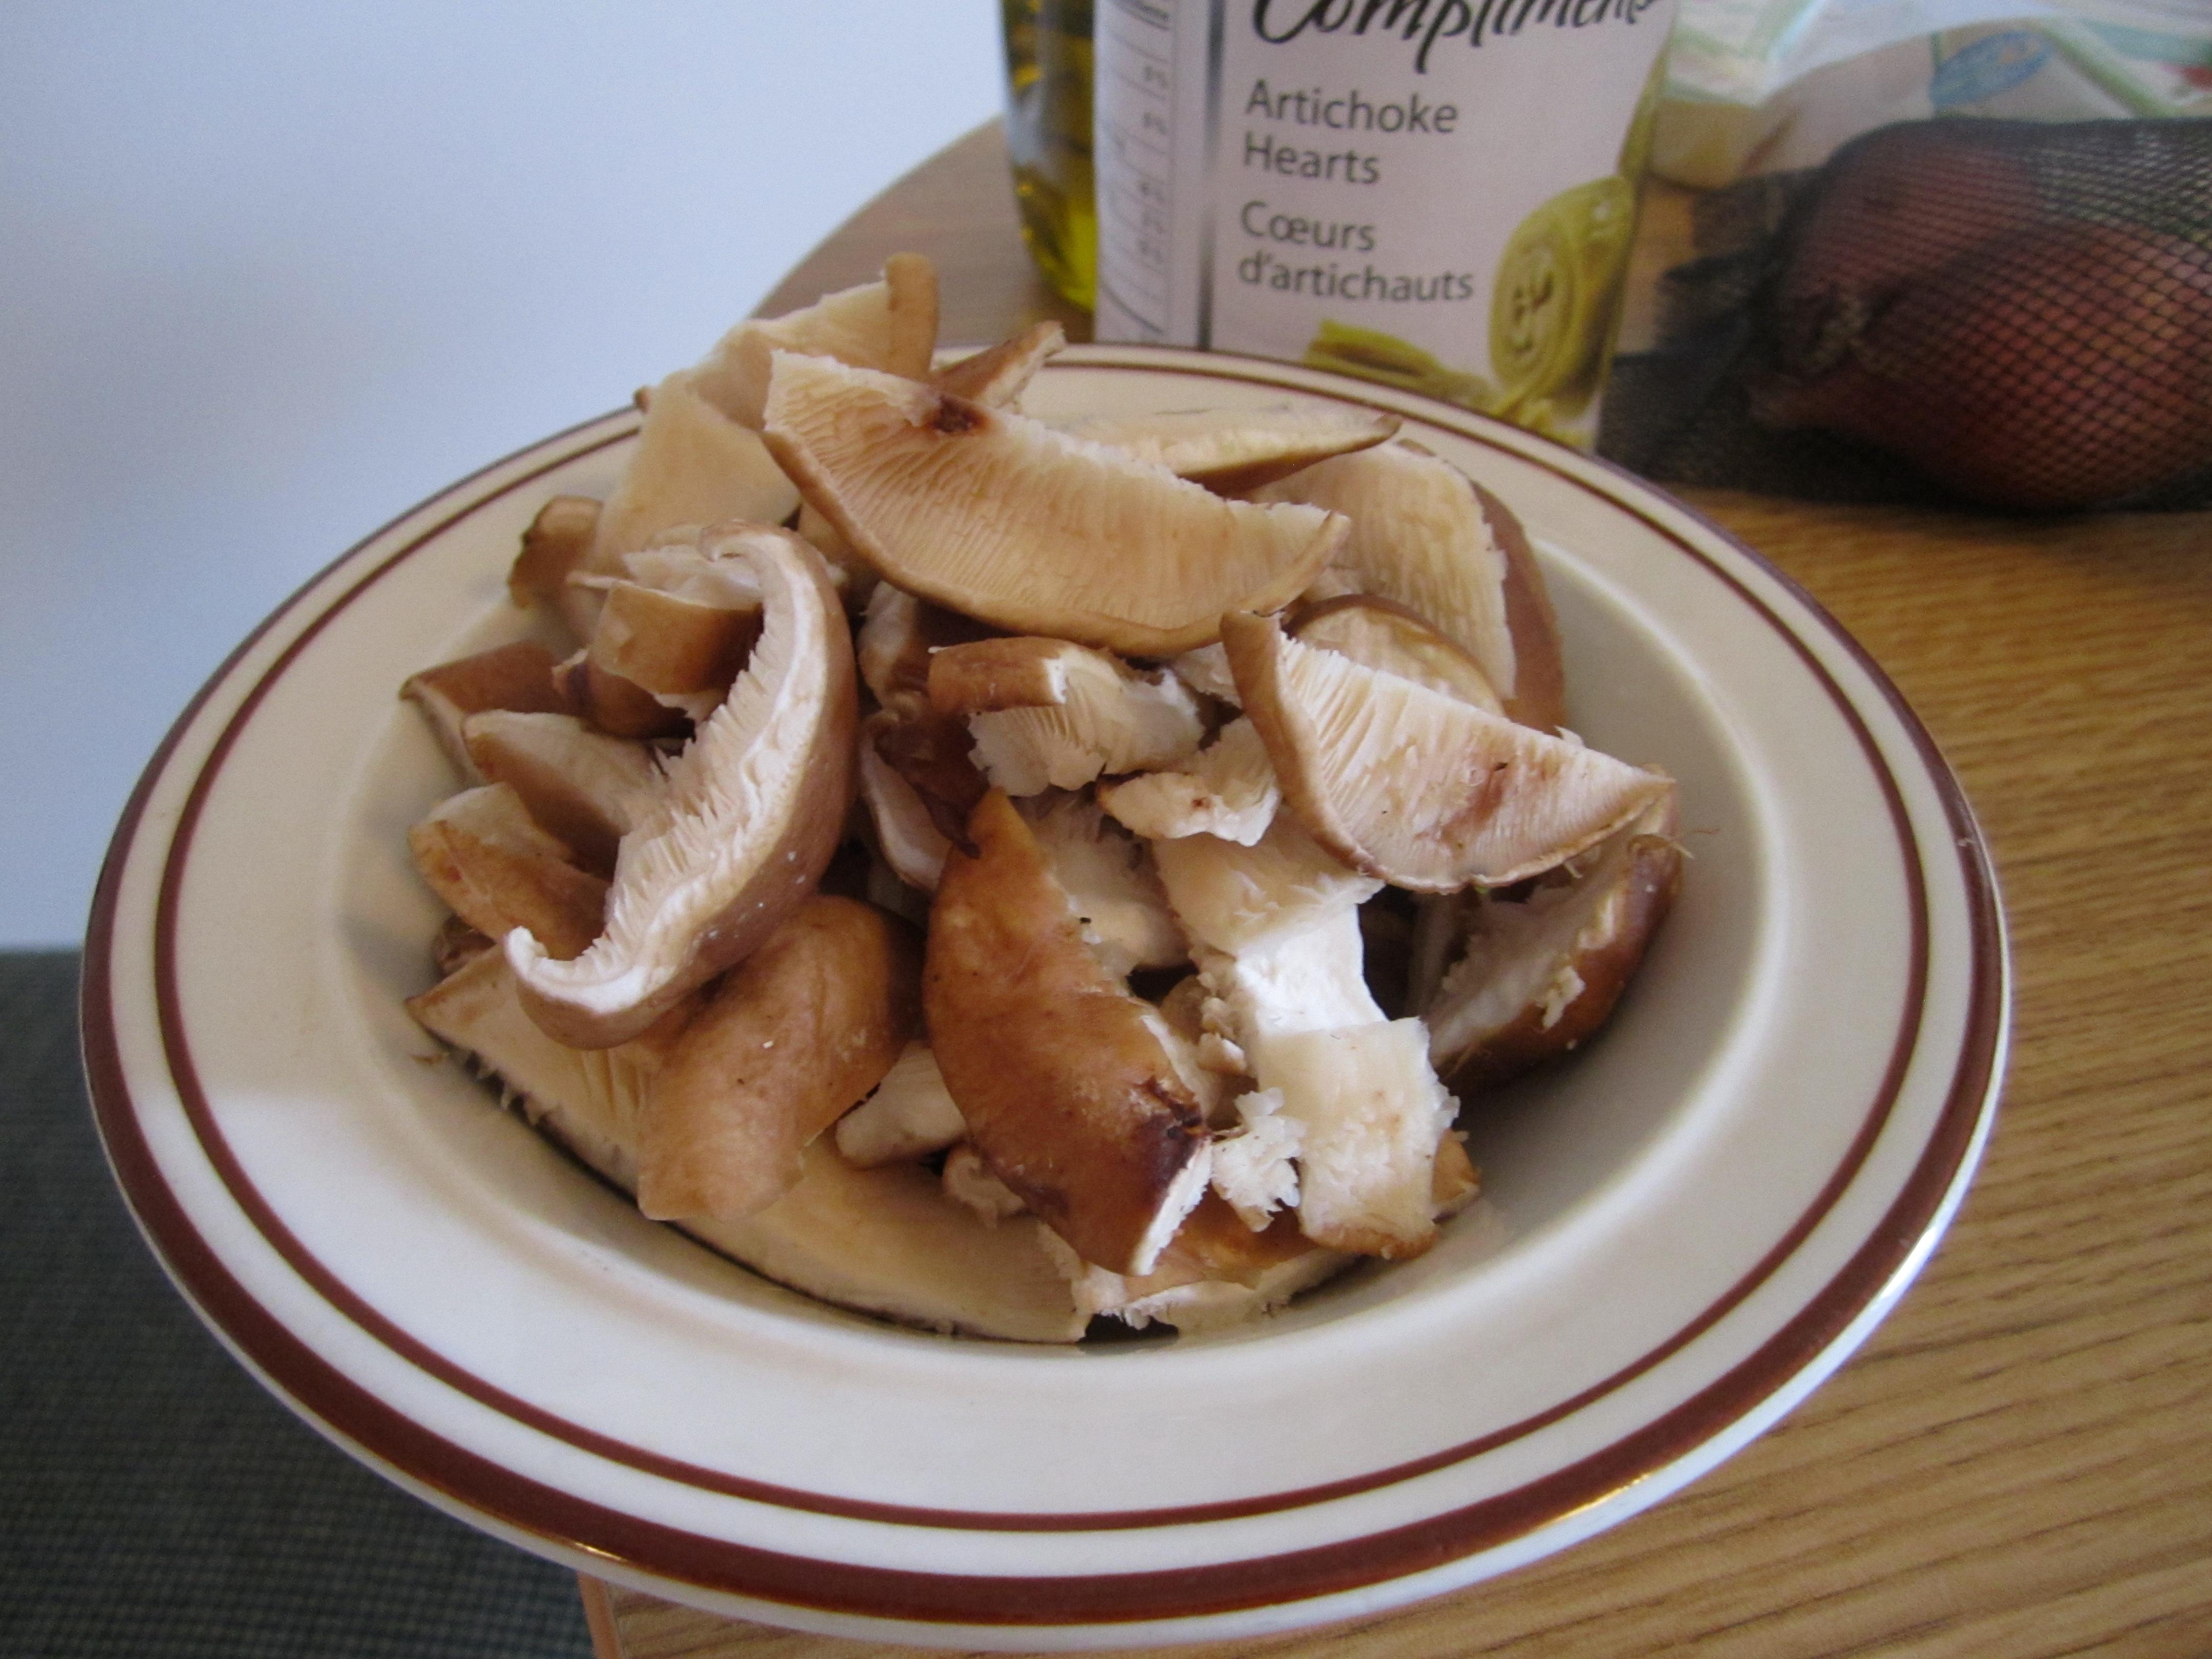 Asparagus, Artichoke and Shiitake Mushroom Risotto | Leslie the Foodie